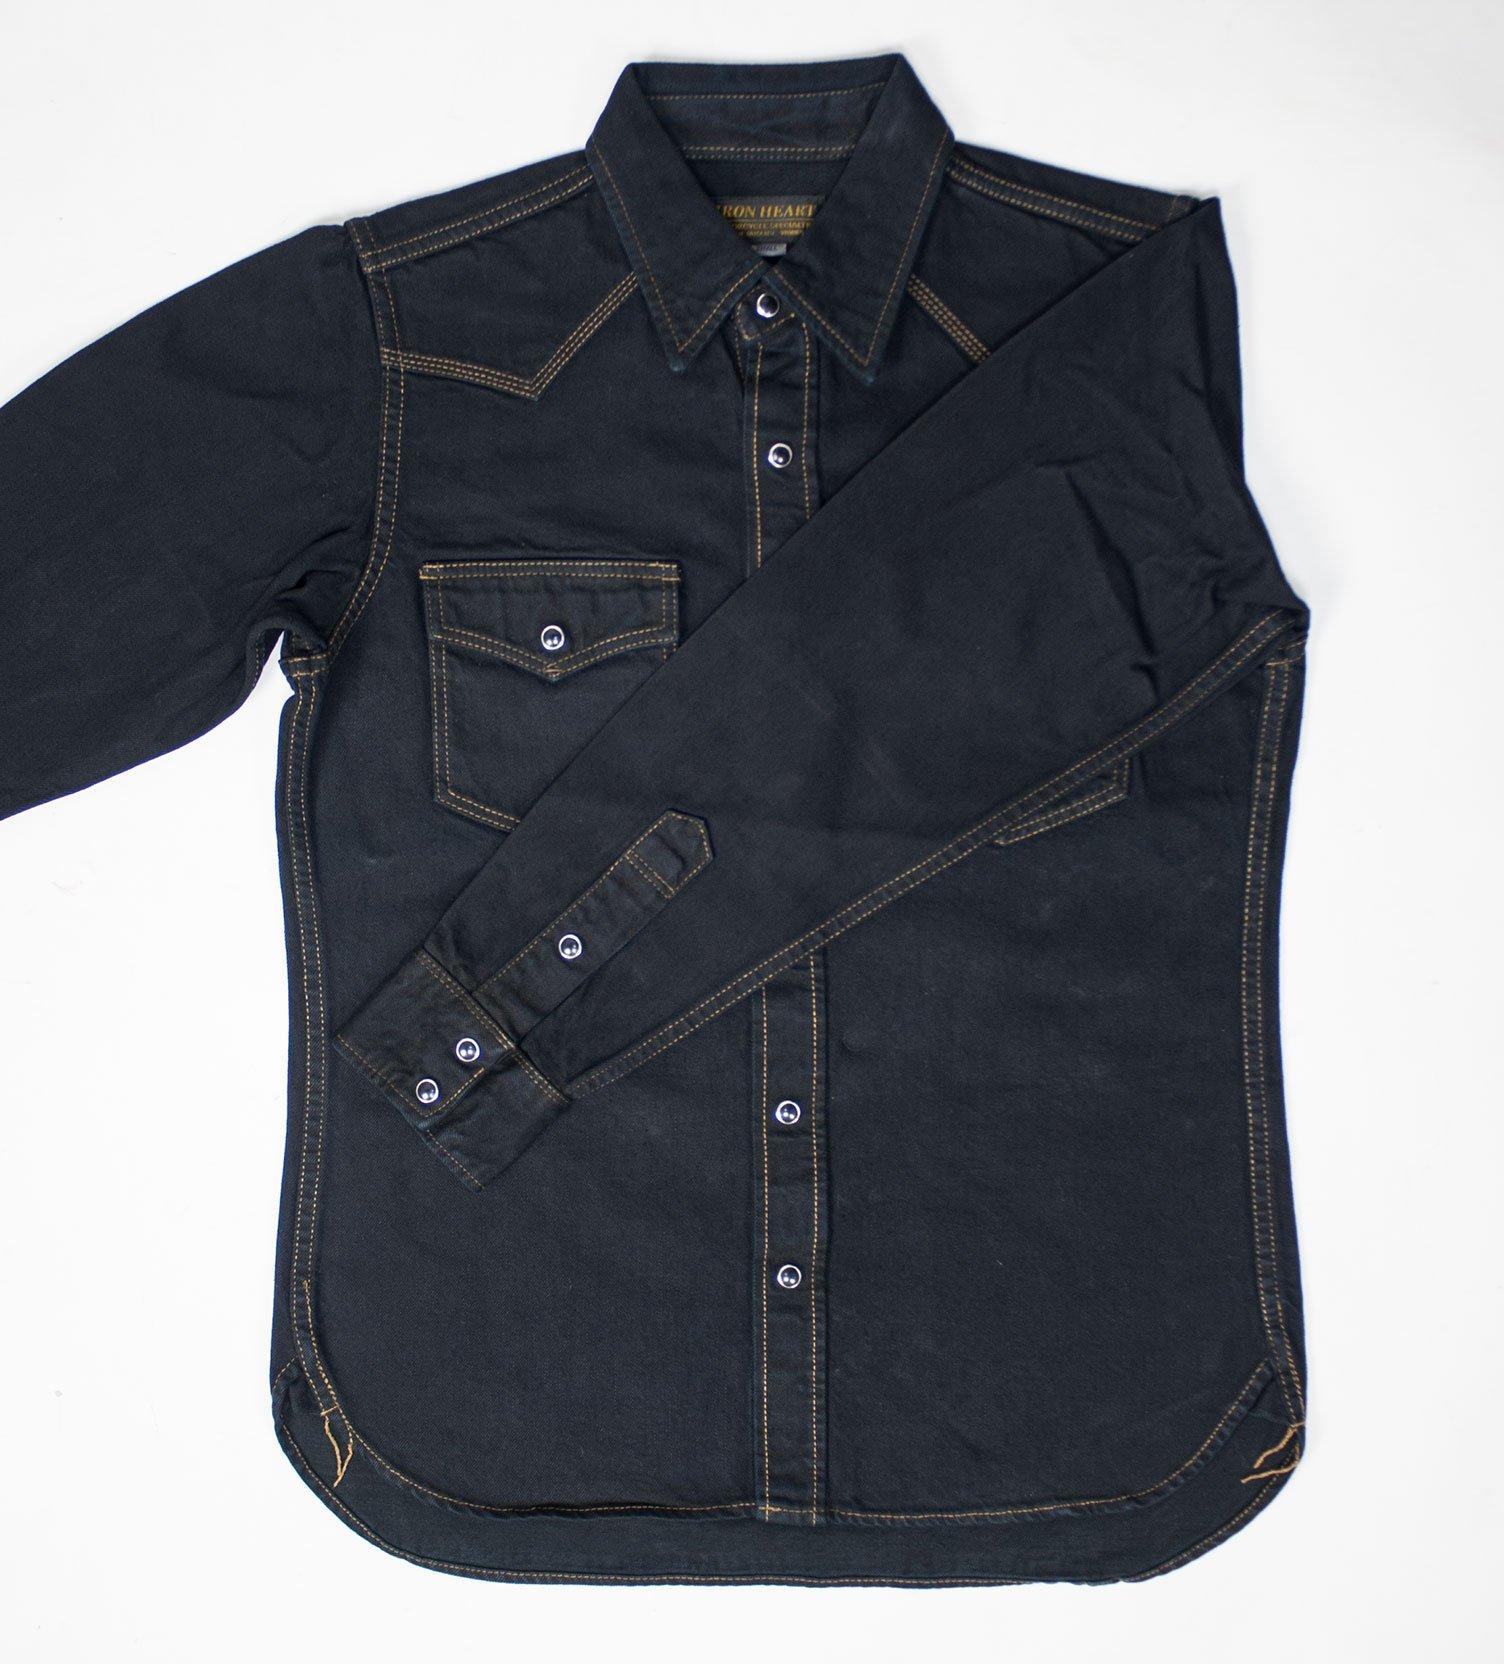 c713ff15a8 Overdyed 12oz Selvedge Denim Western Shirt